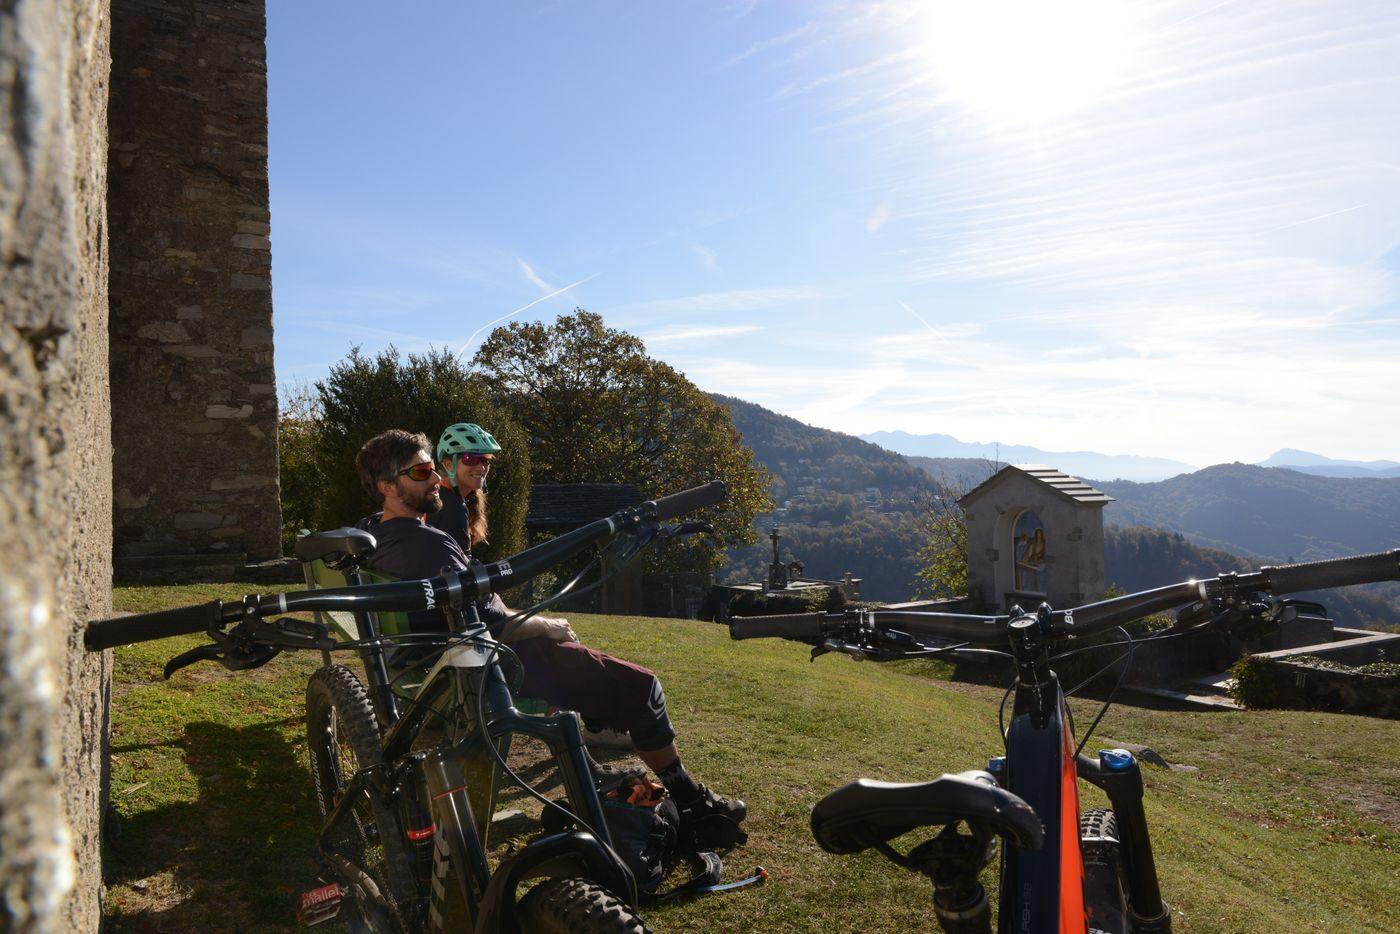 Biken in Lugano - 13